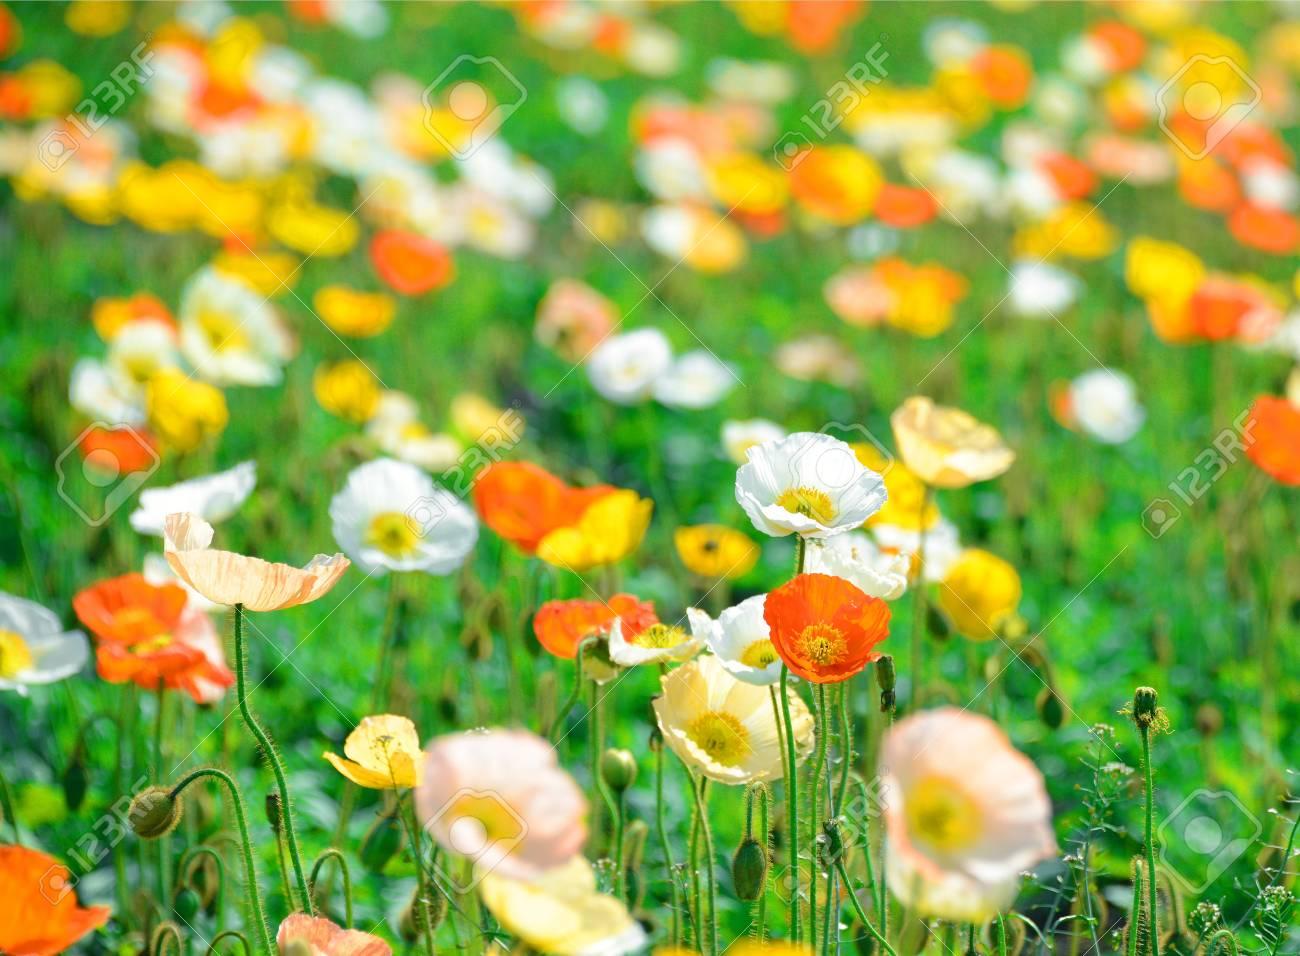 poppy flower field in spring Stock Photo - 19807185